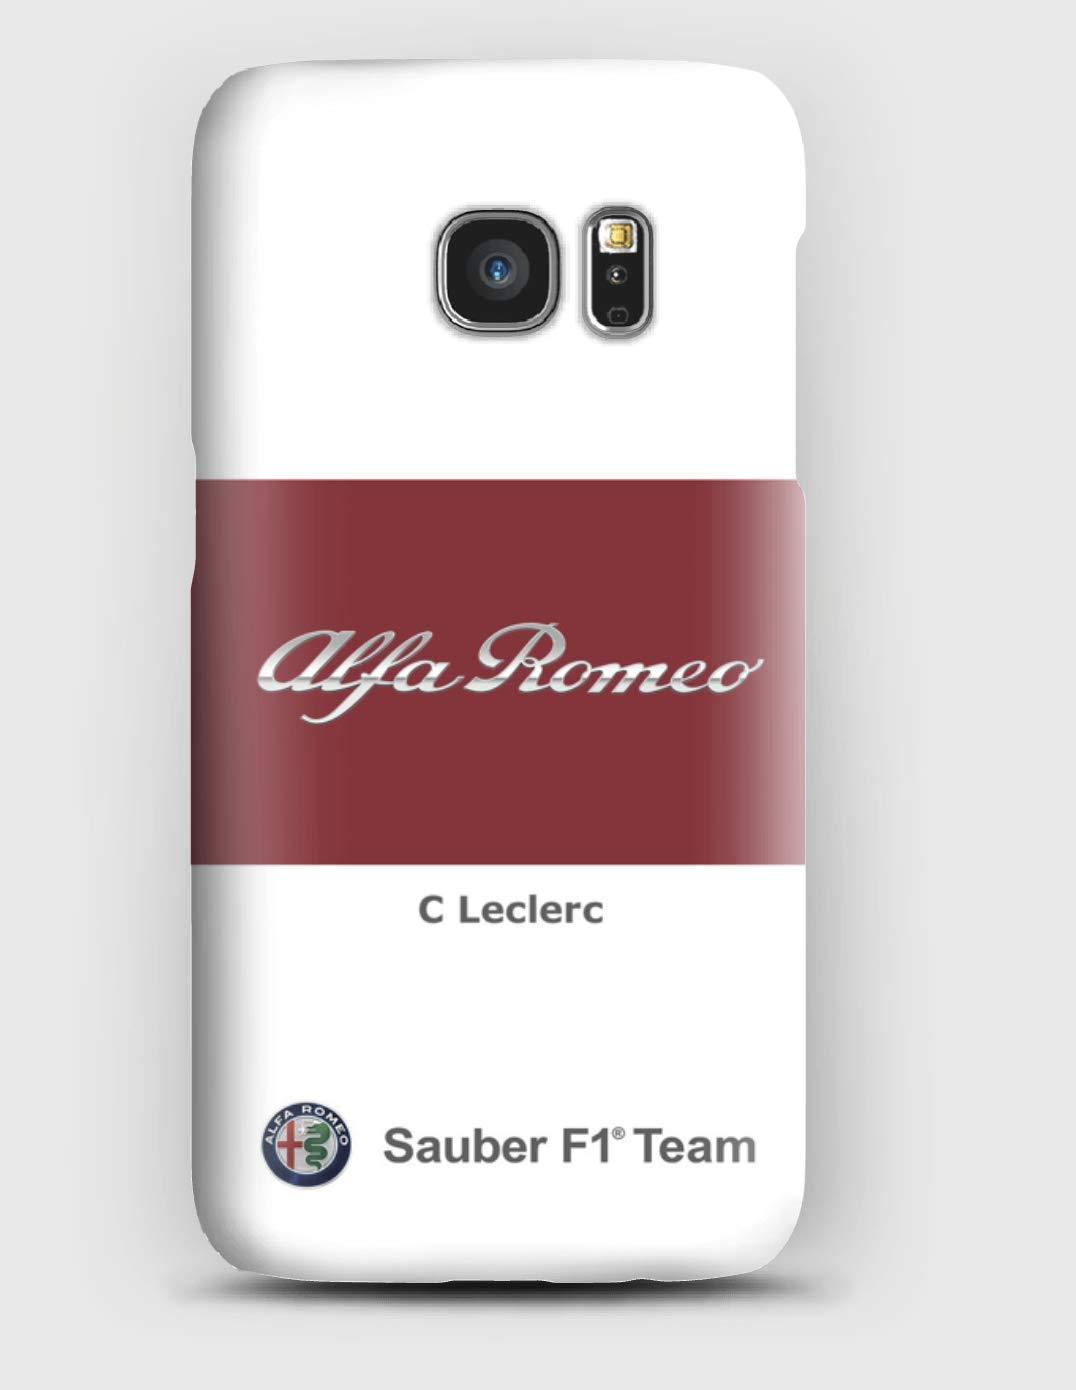 Alfa Romeo C Leclerc coque pour Samsung S6, S7, S8, S9, A3, A5, A7,A8, J3, J5, Note 4, 5, 8,9, Grand prime,